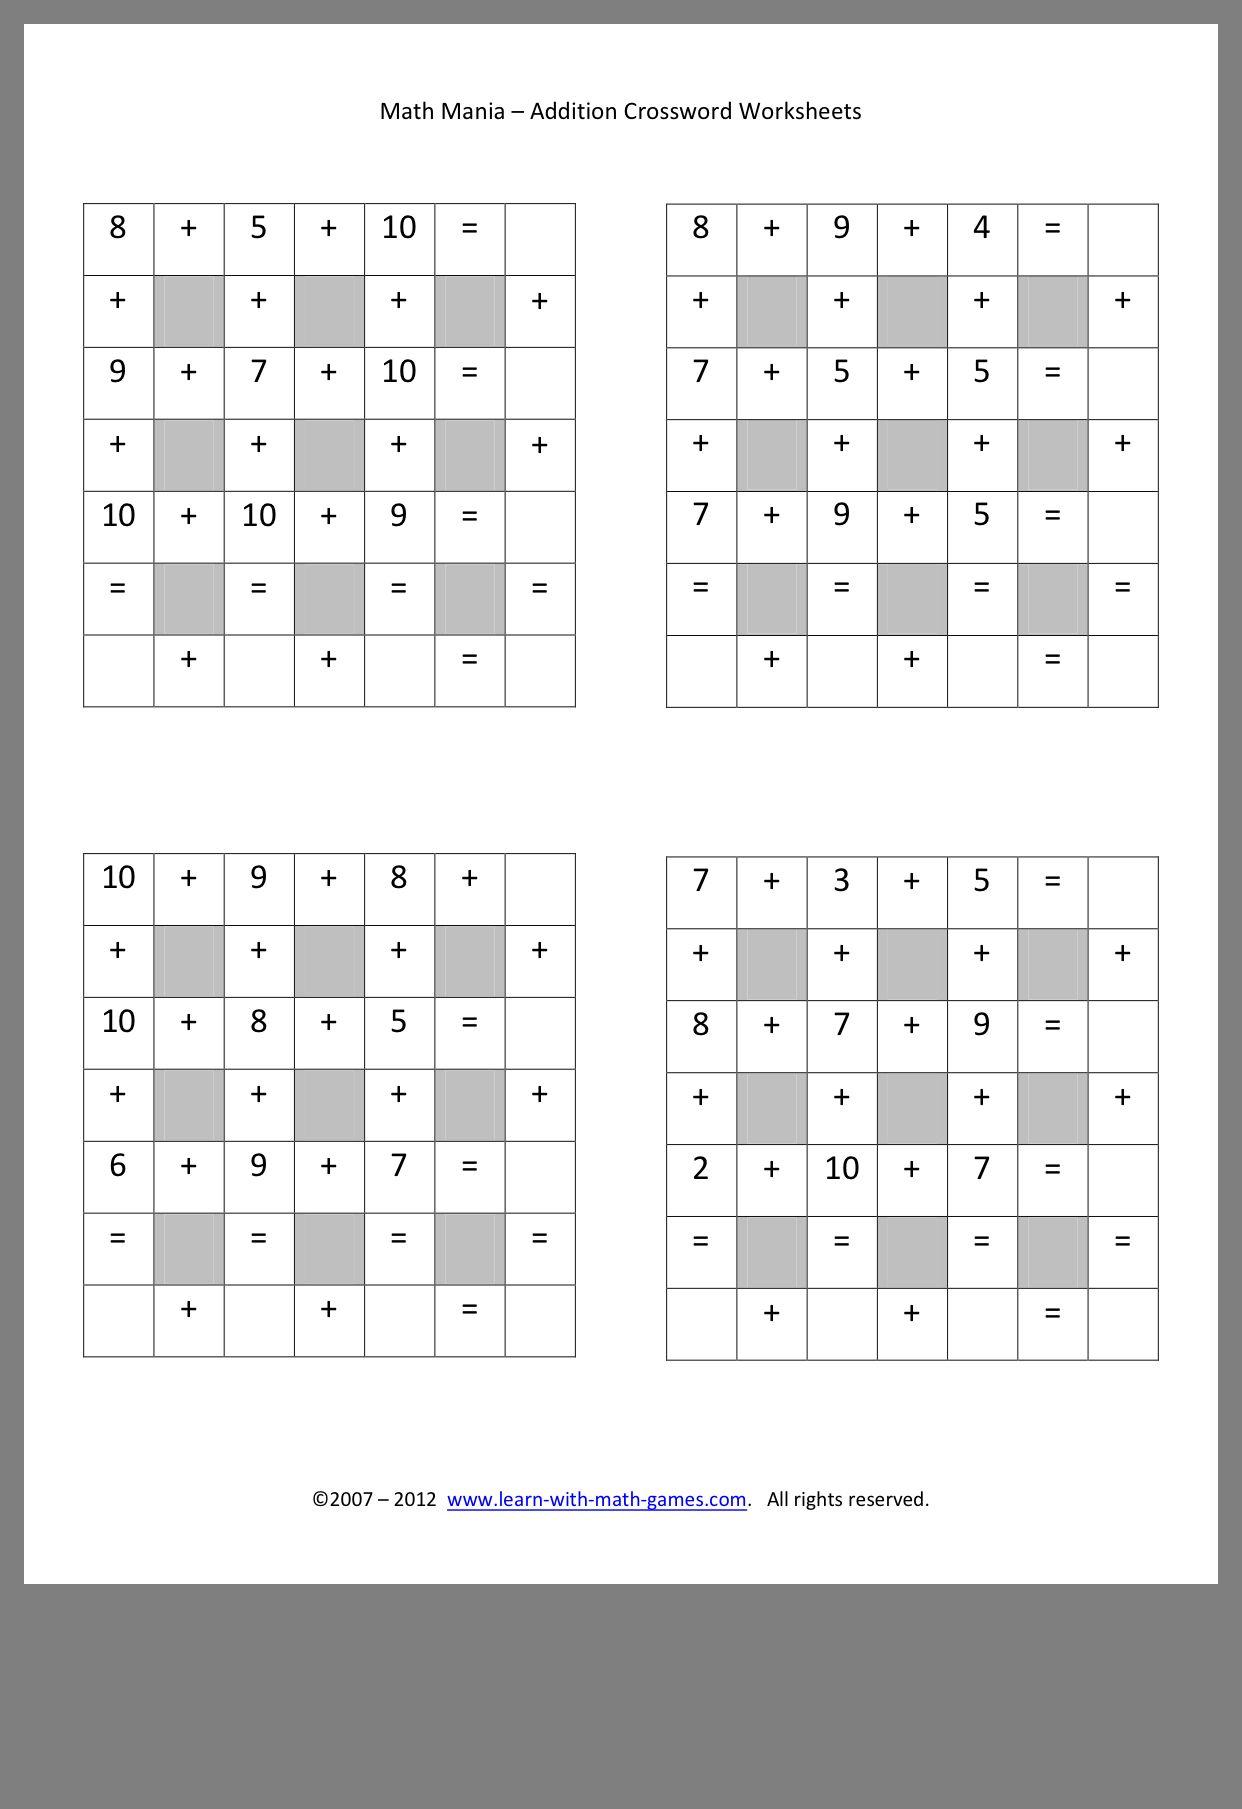 Pin By Mirit On Math Worksheets Maths Worksheet Math Addition Math Worksheets Math addition puzzle worksheets